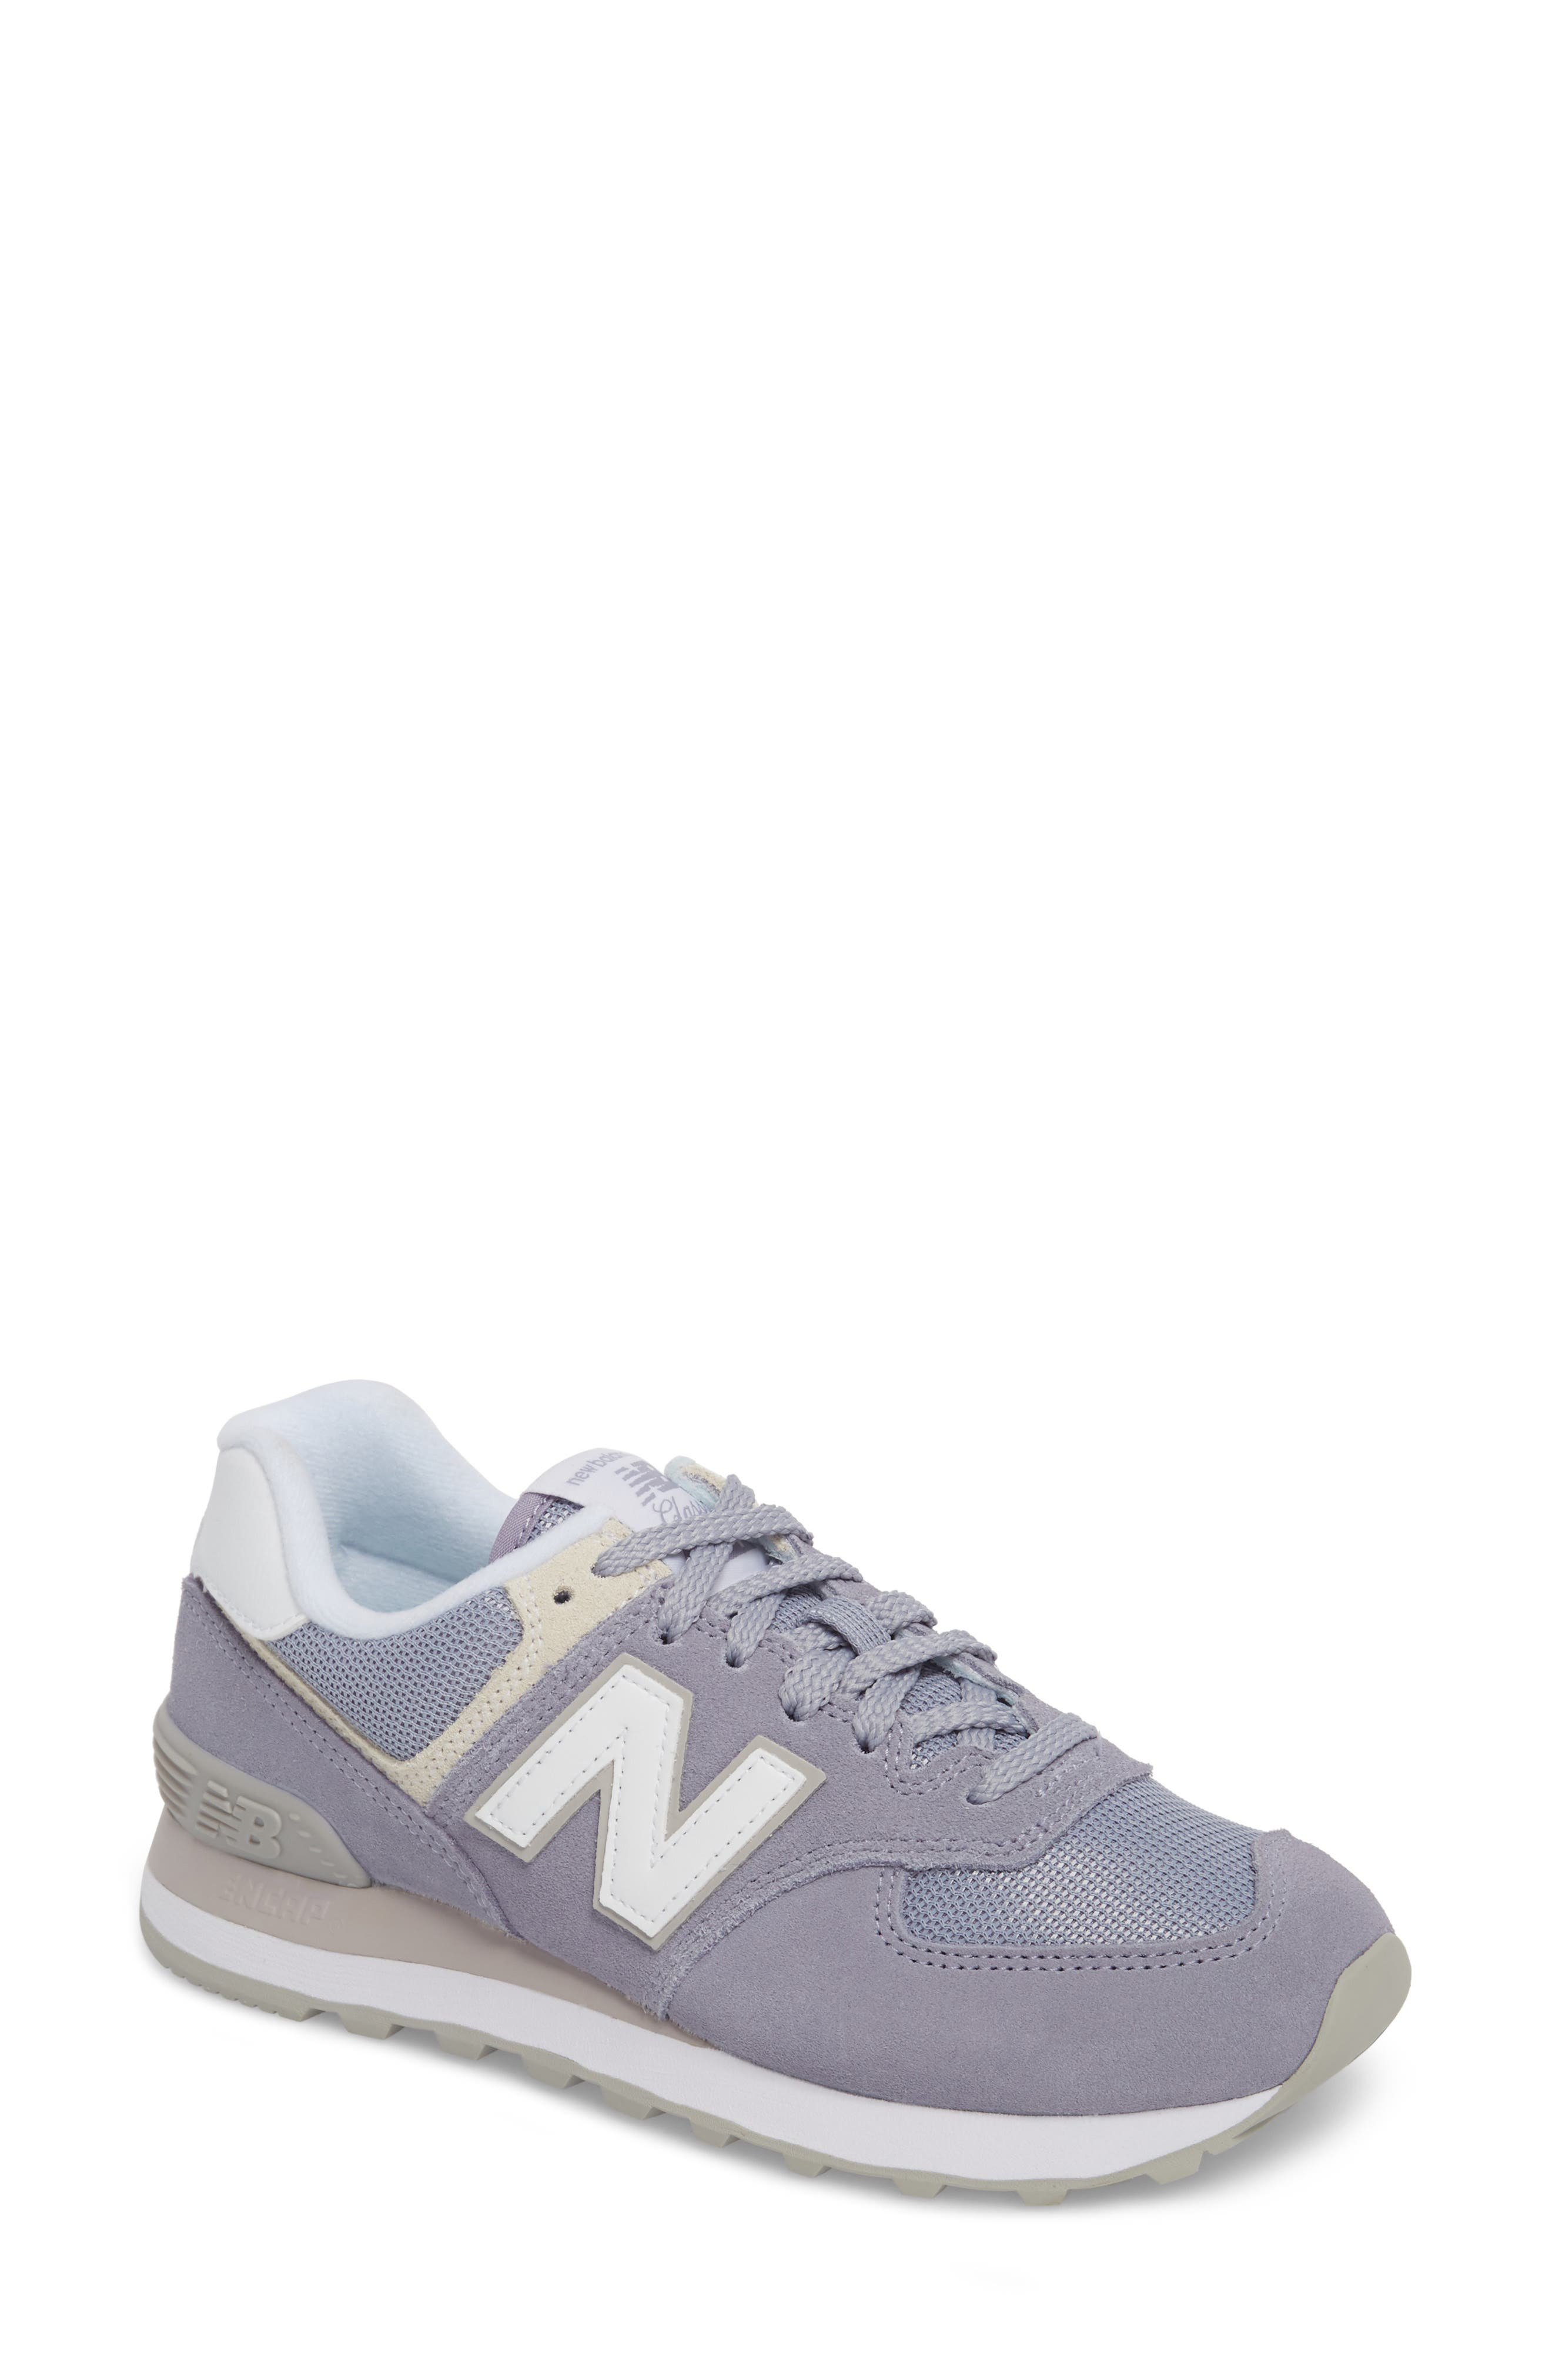 New Balance \u0027574\u0027 Sneaker ...